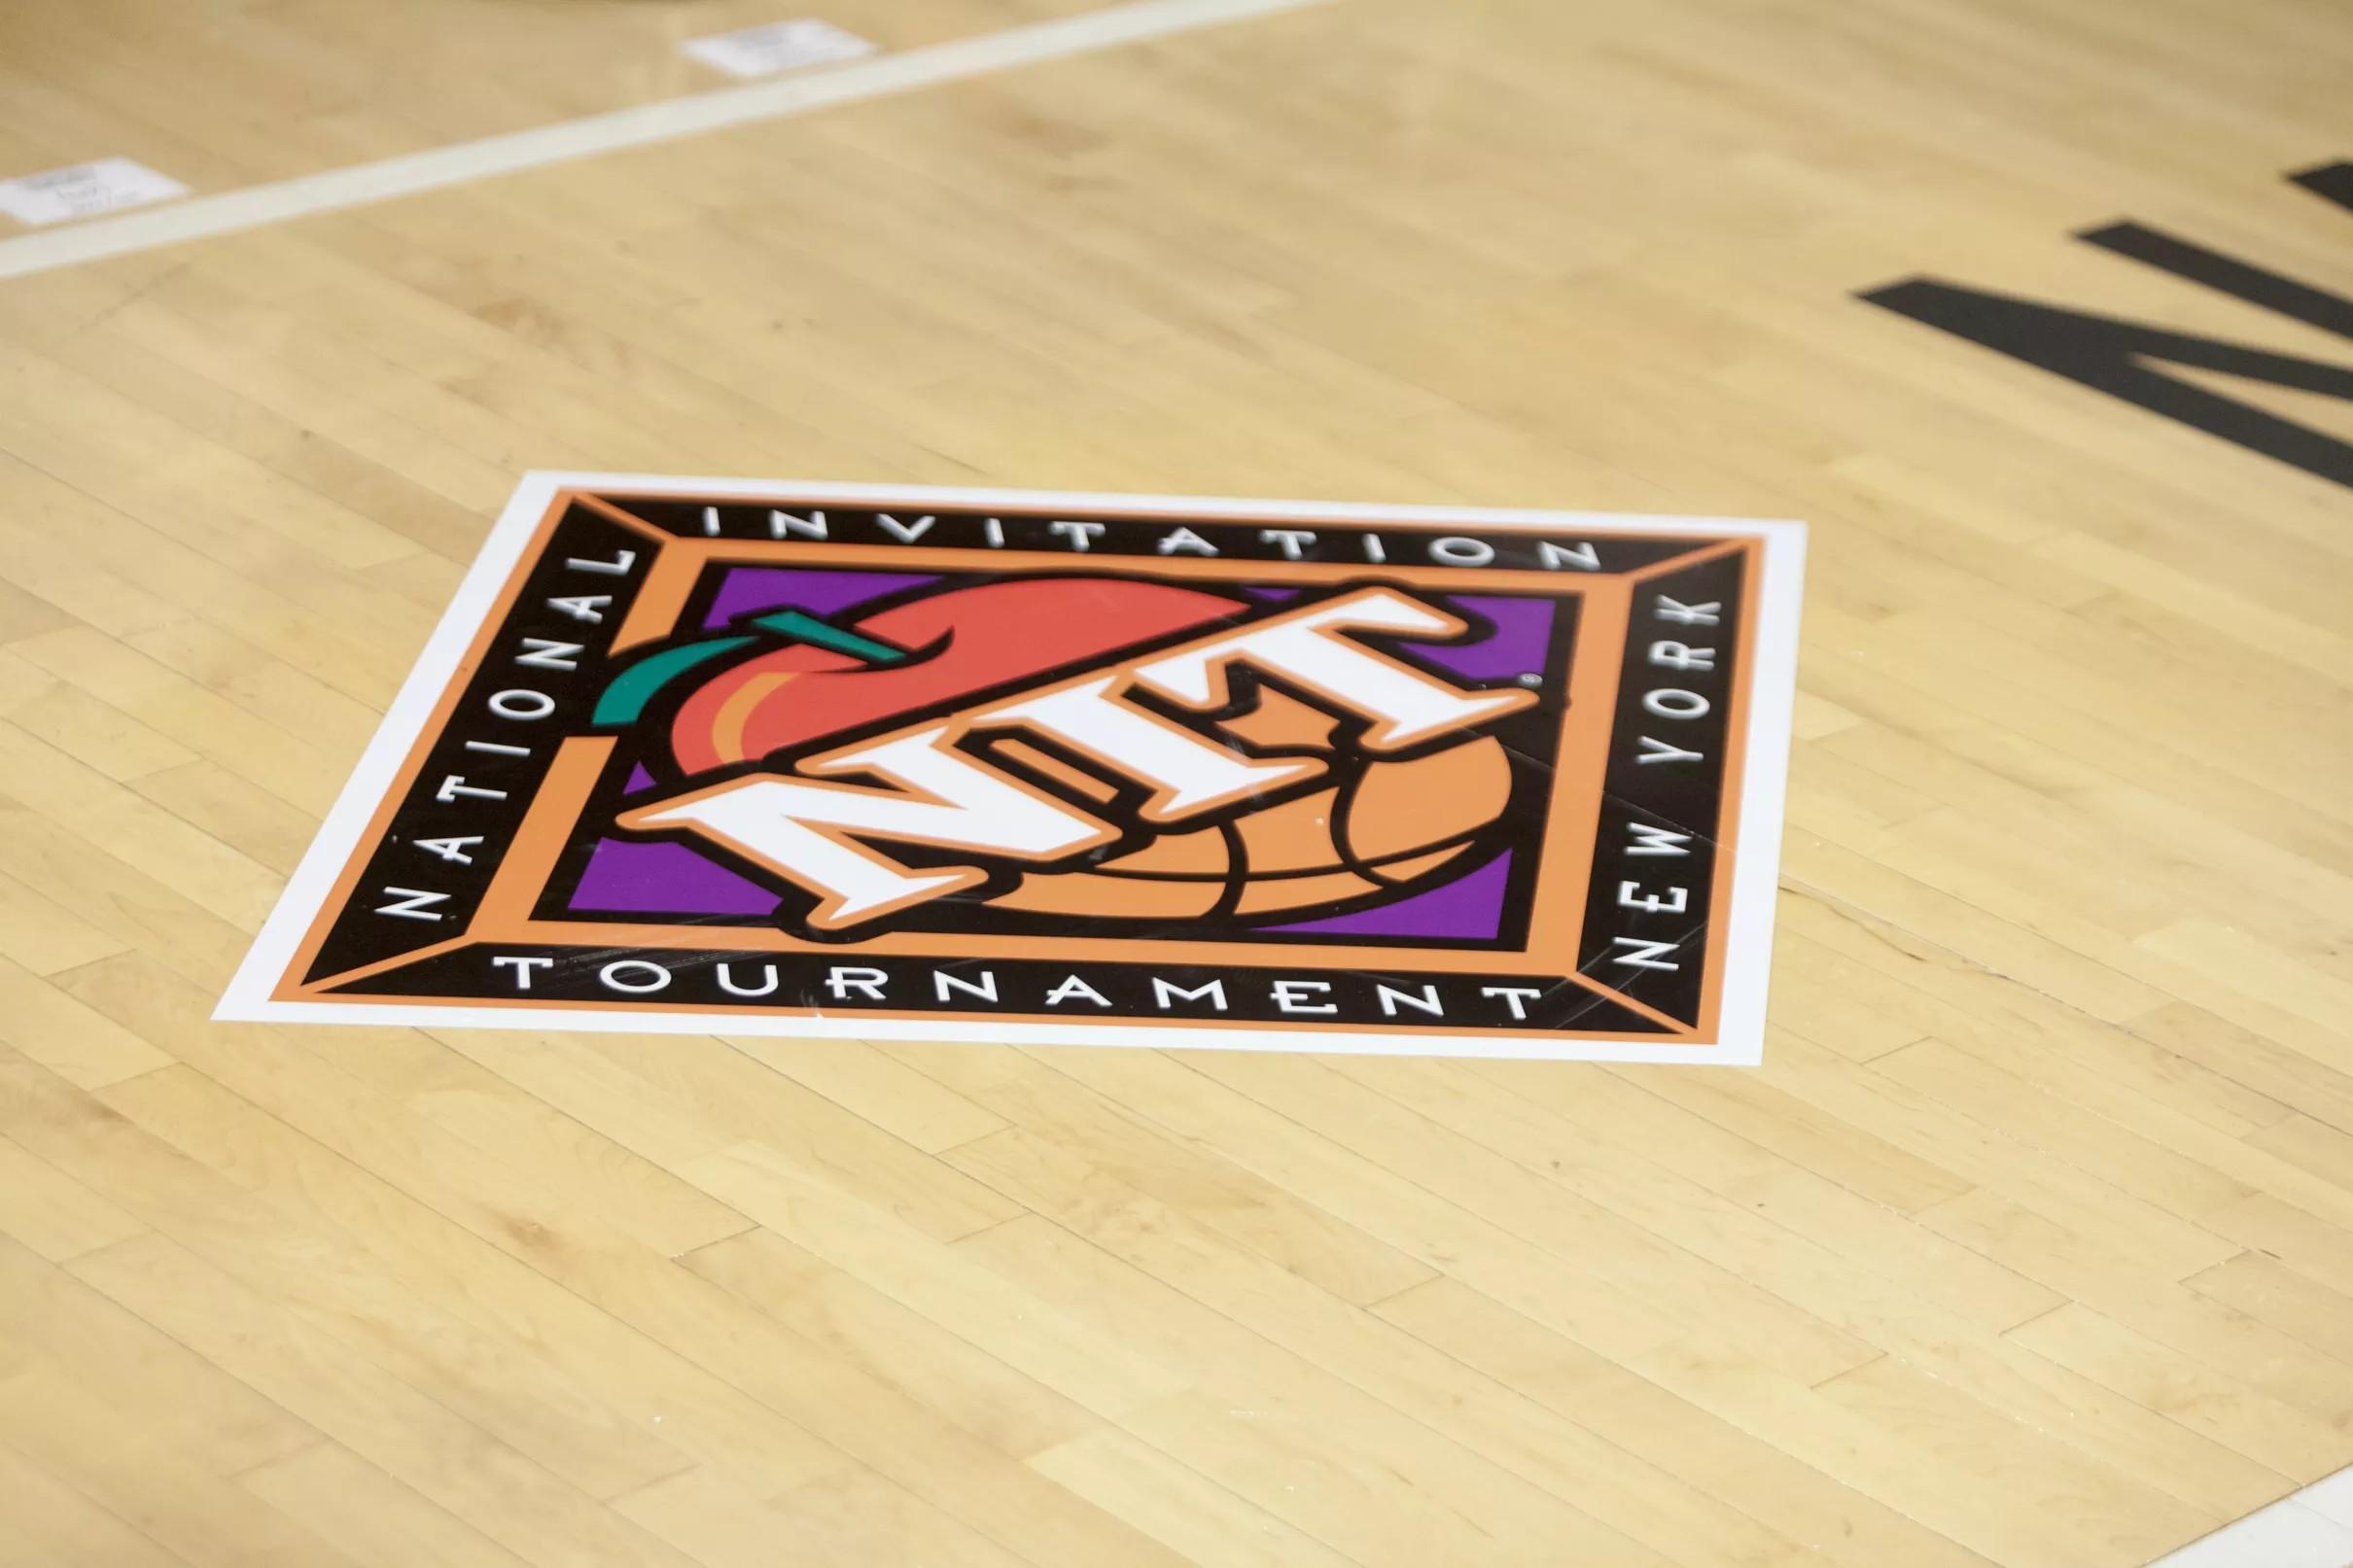 4370fa98c35 2019 NIT Game Thread: TCU Basketball vs Texas